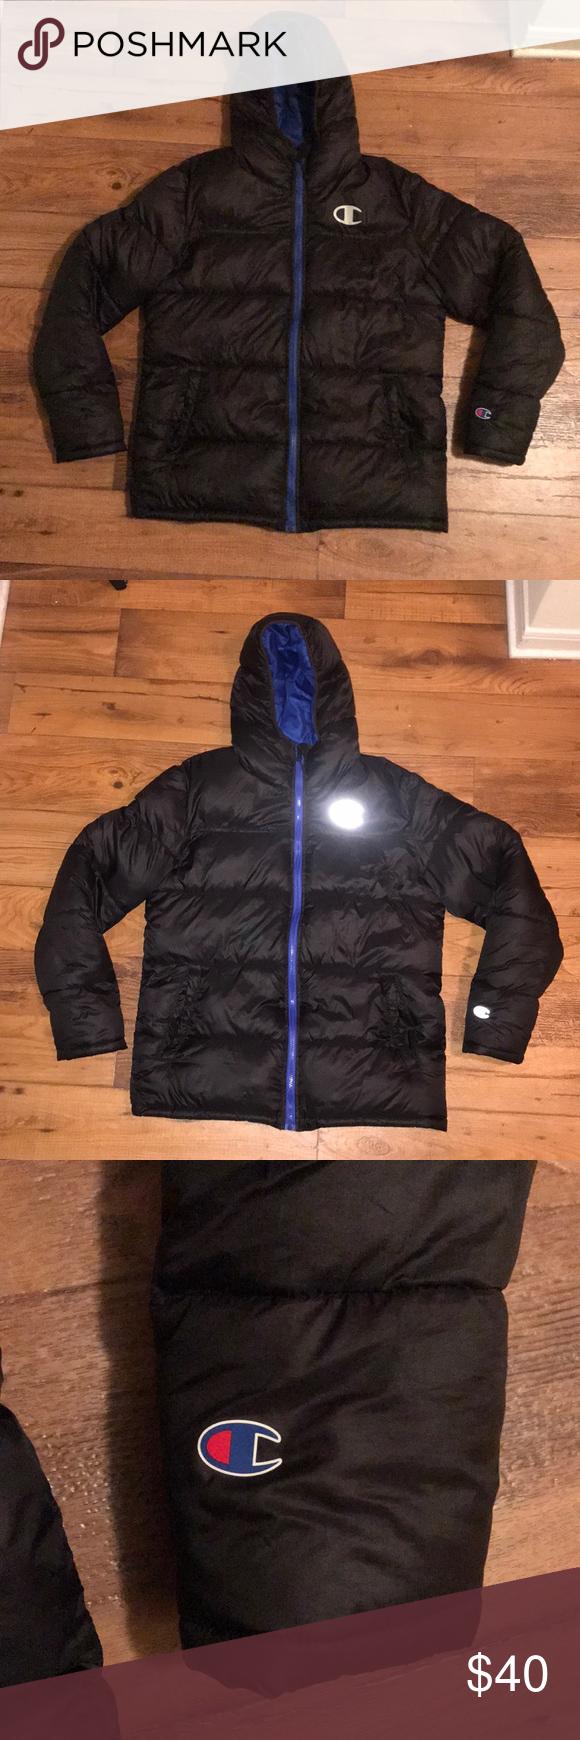 Essential Champion Puffer Jacket Clothes Design Champion Jacket Jackets [ 1740 x 580 Pixel ]